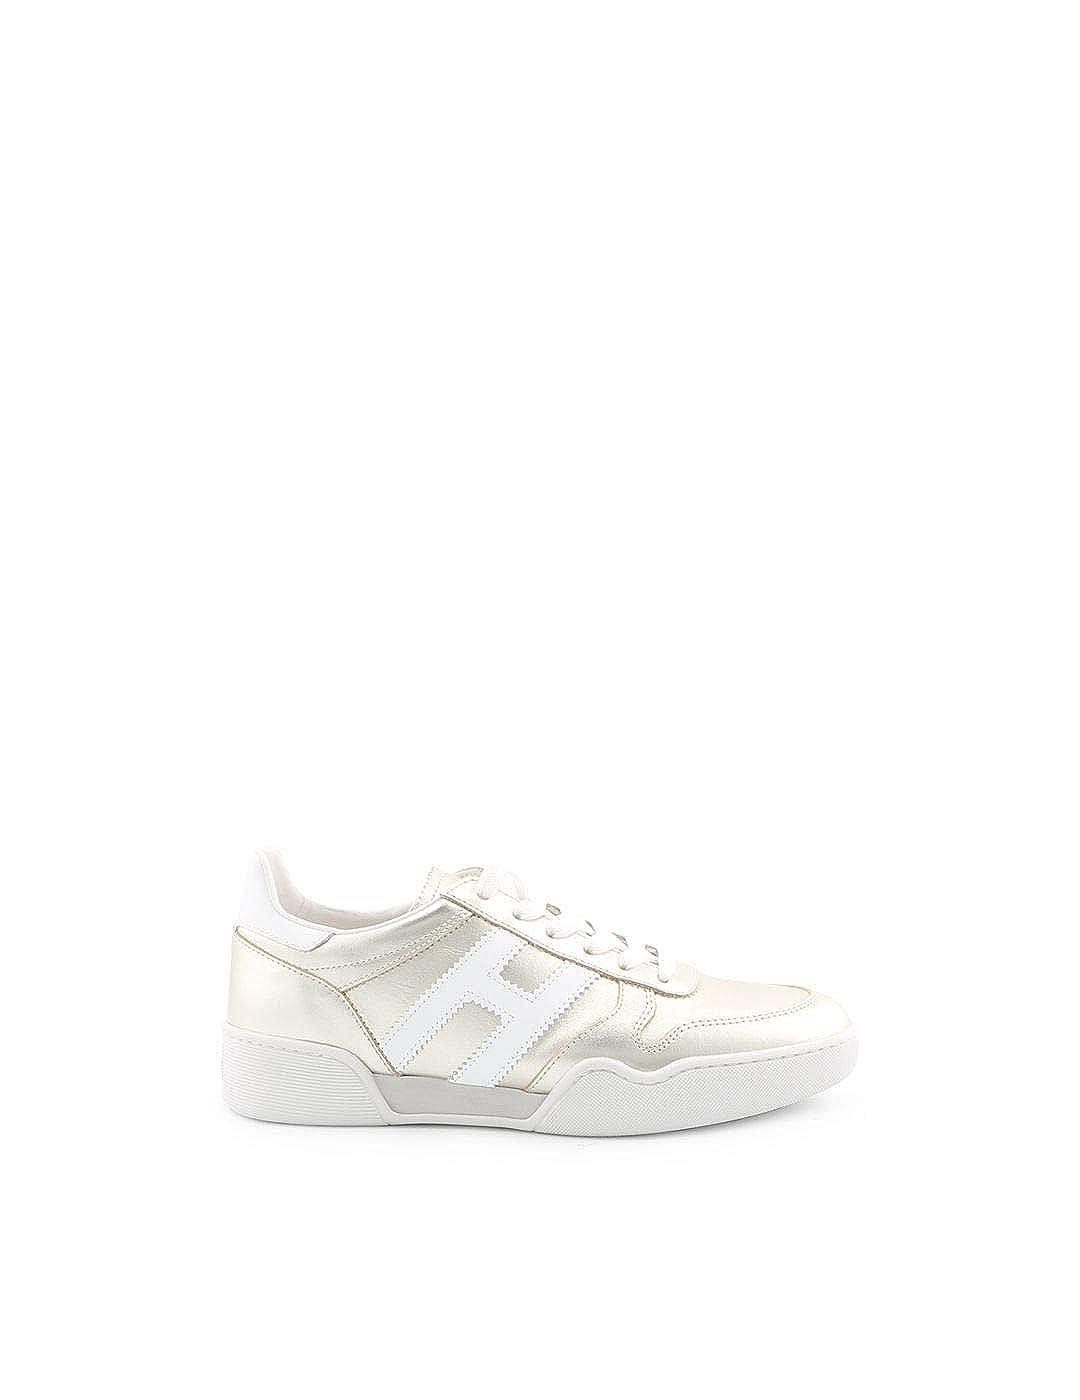 - Hogan Women's HXW3570AC40I81904X gold Leather Sneakers